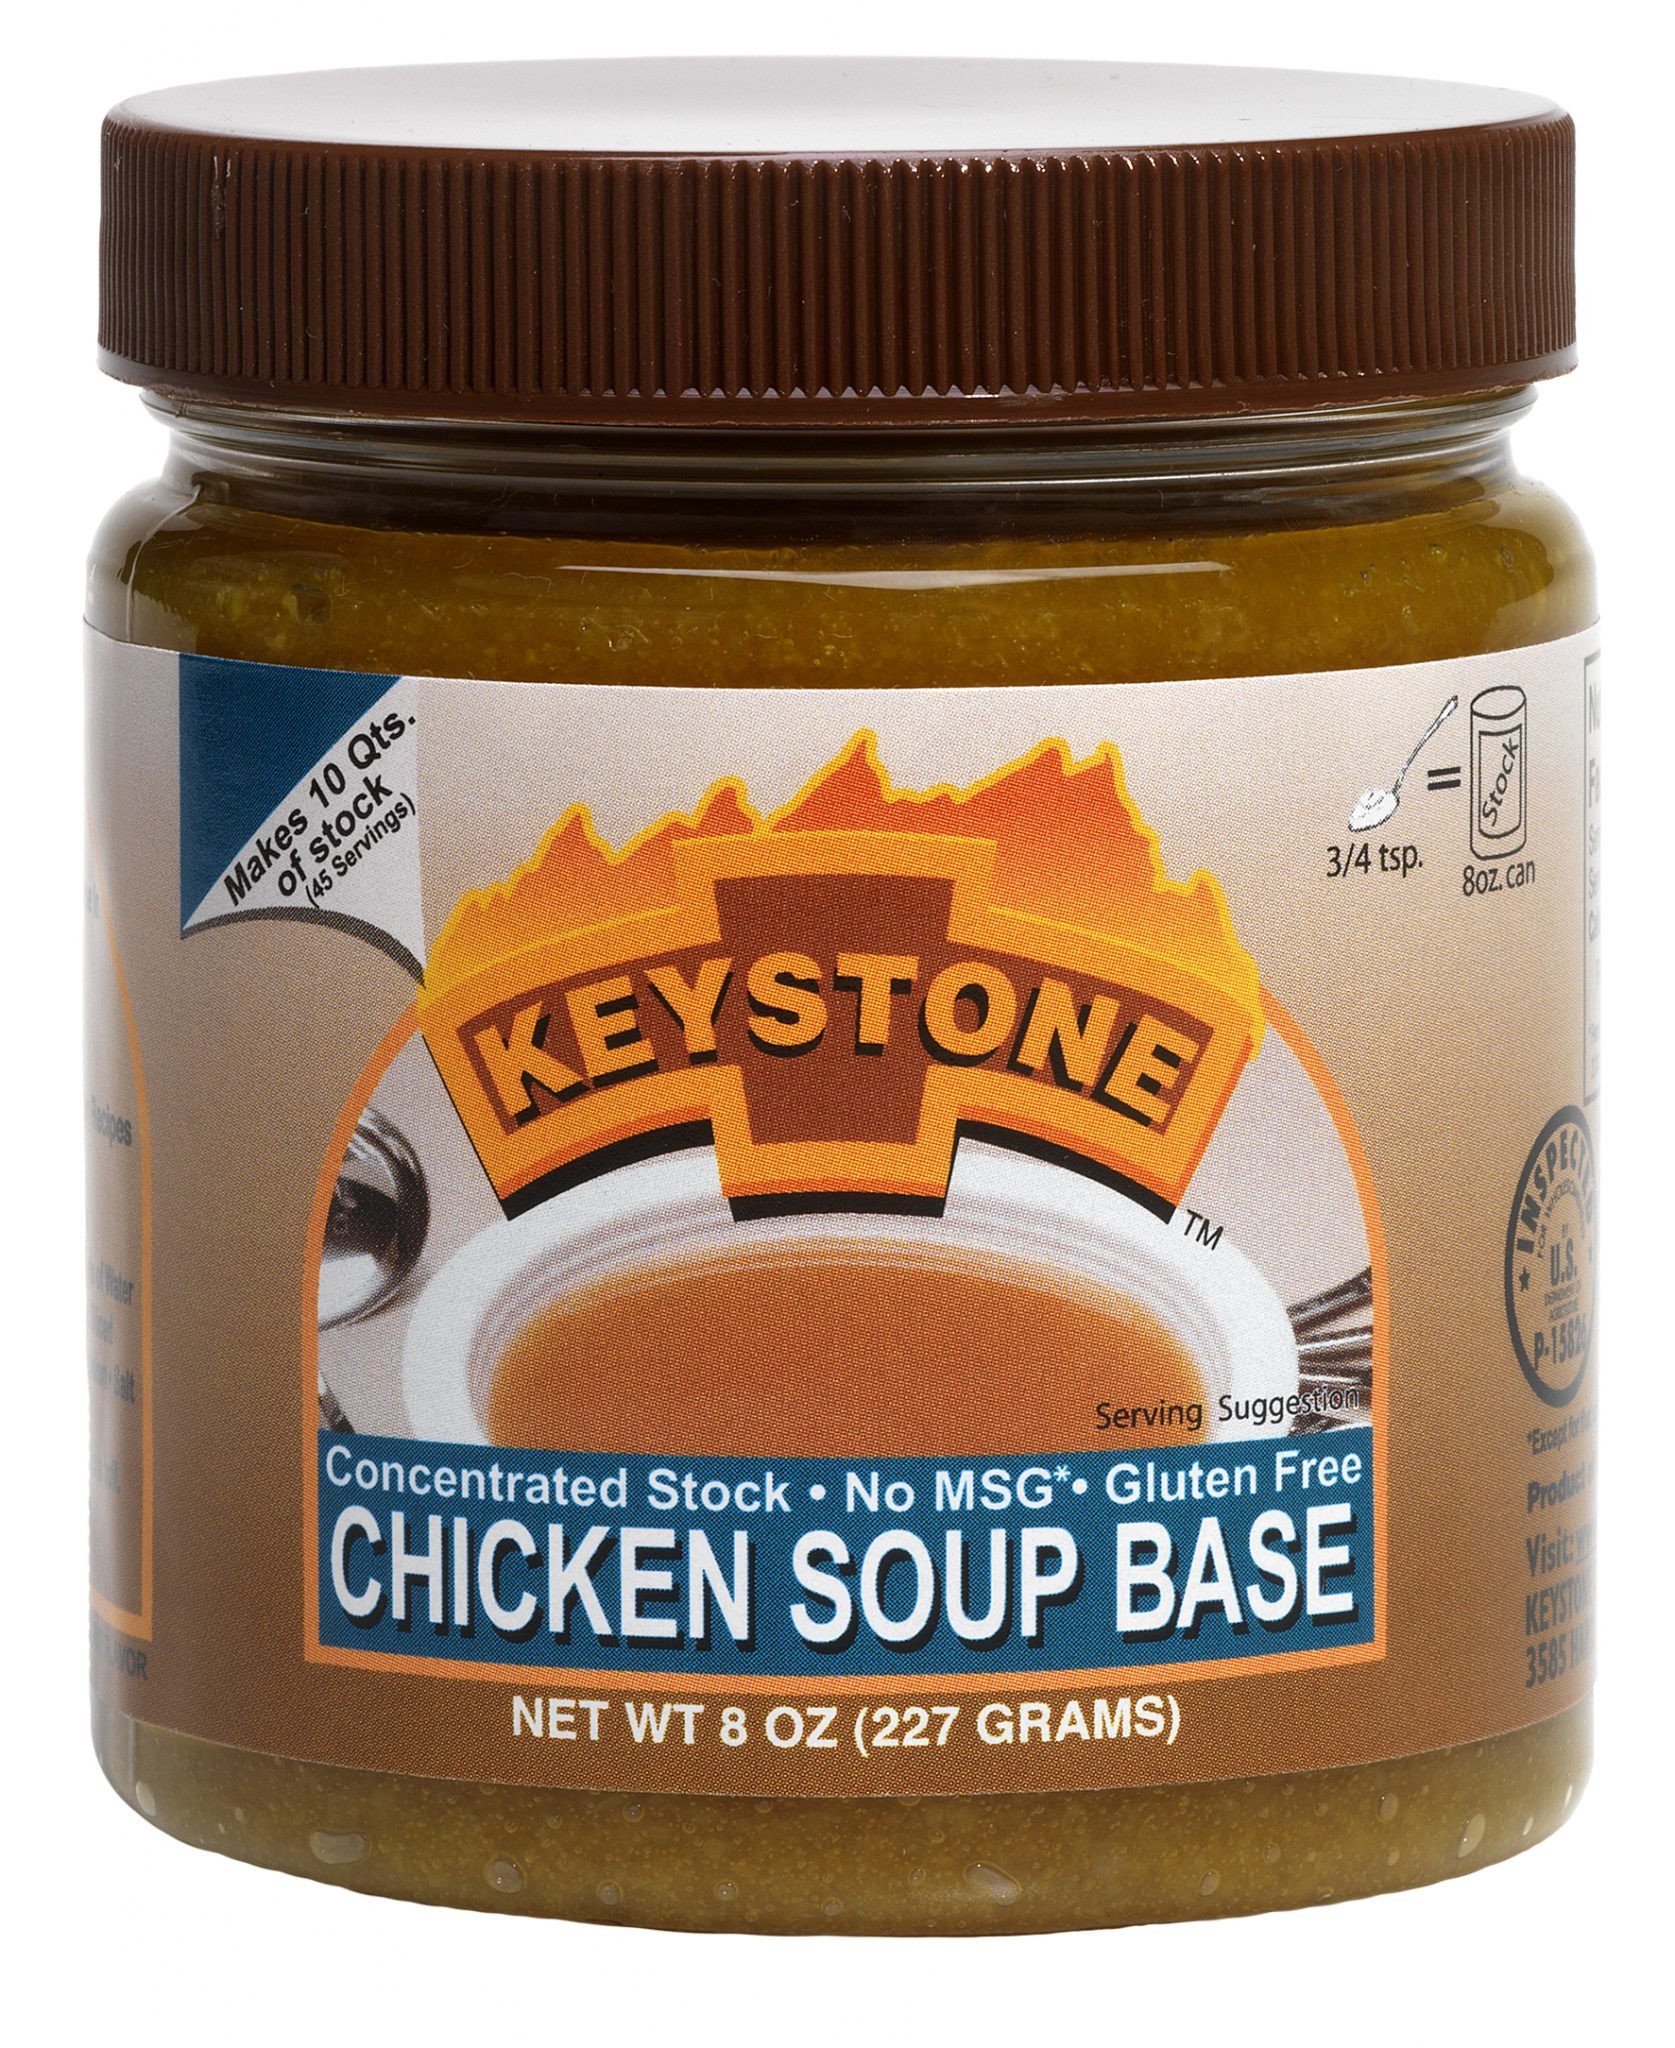 Chicken Soup Base  Keystone Chicken Soup Base6 jars – 8 oz – Keystone Meats